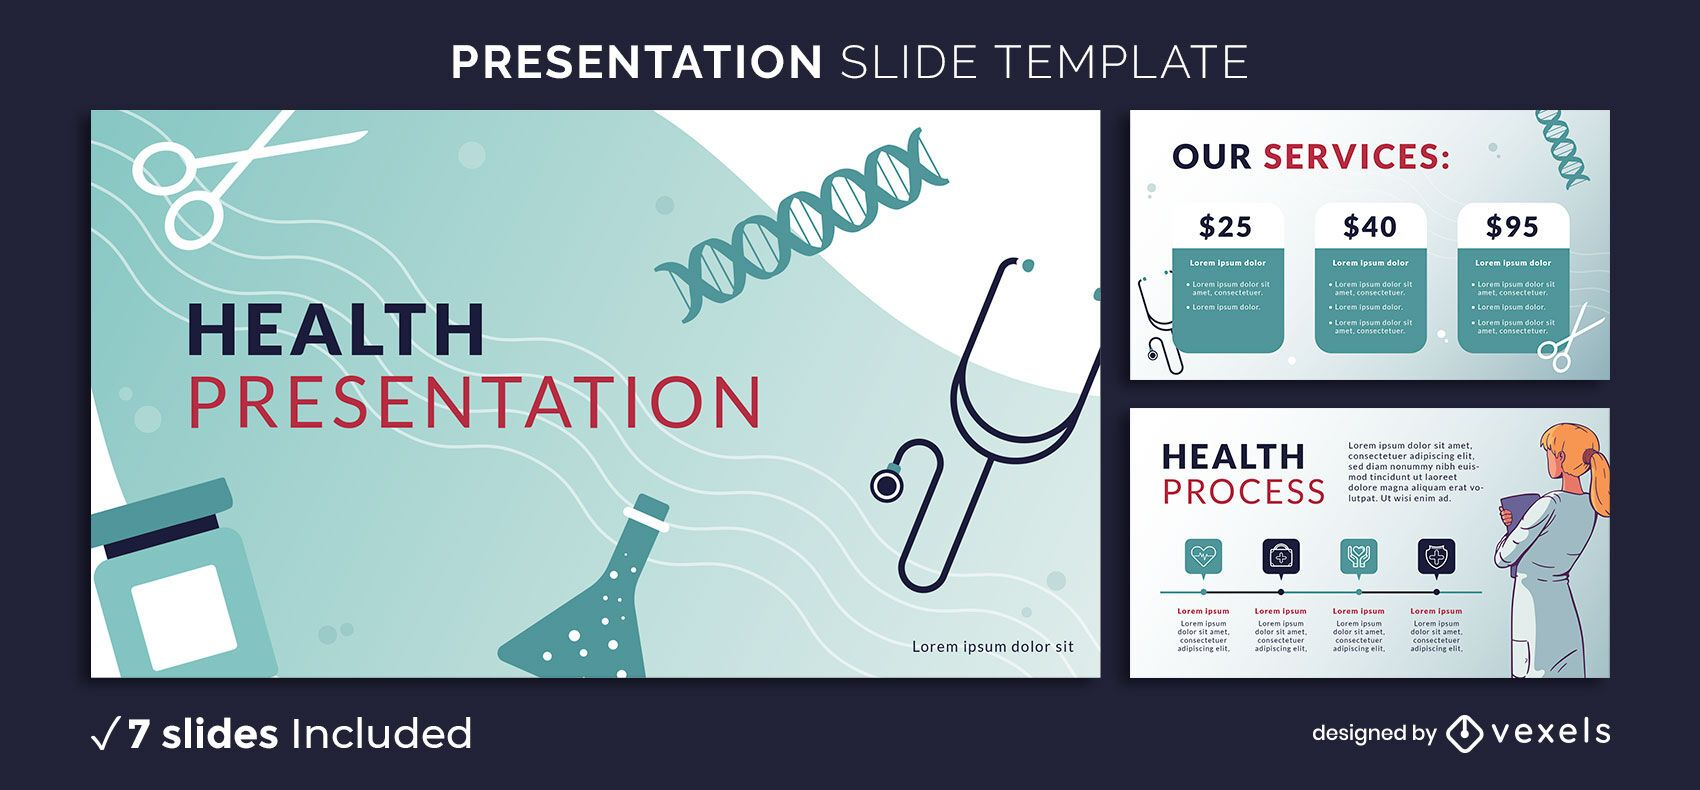 Medical Health Presentation Template